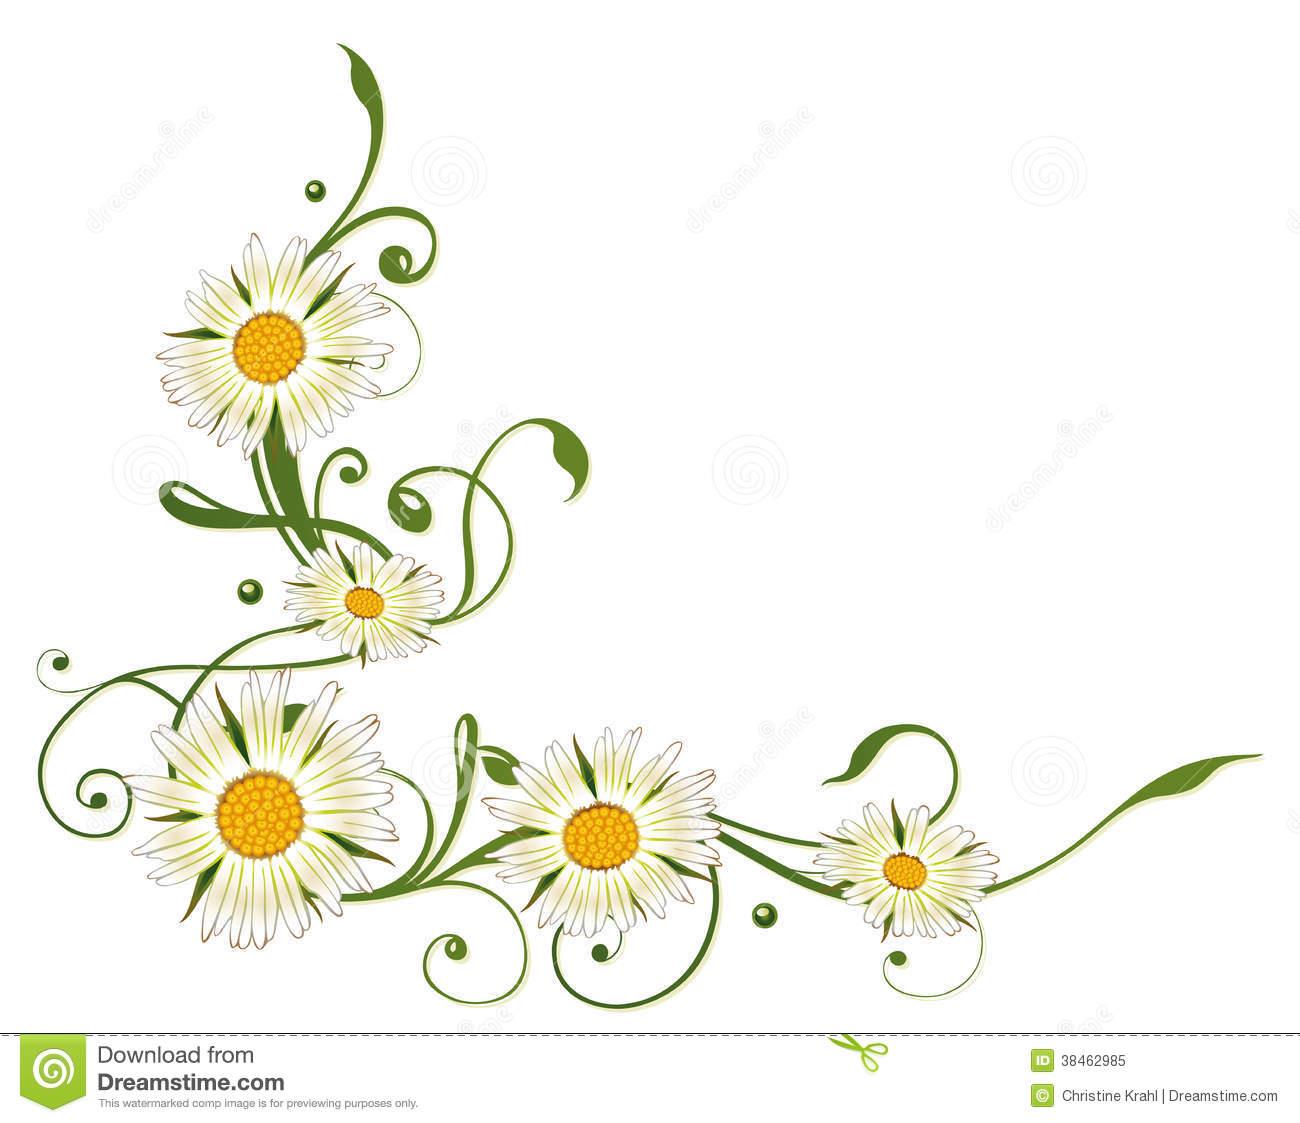 Daisies clipart vine.  daisy clip art